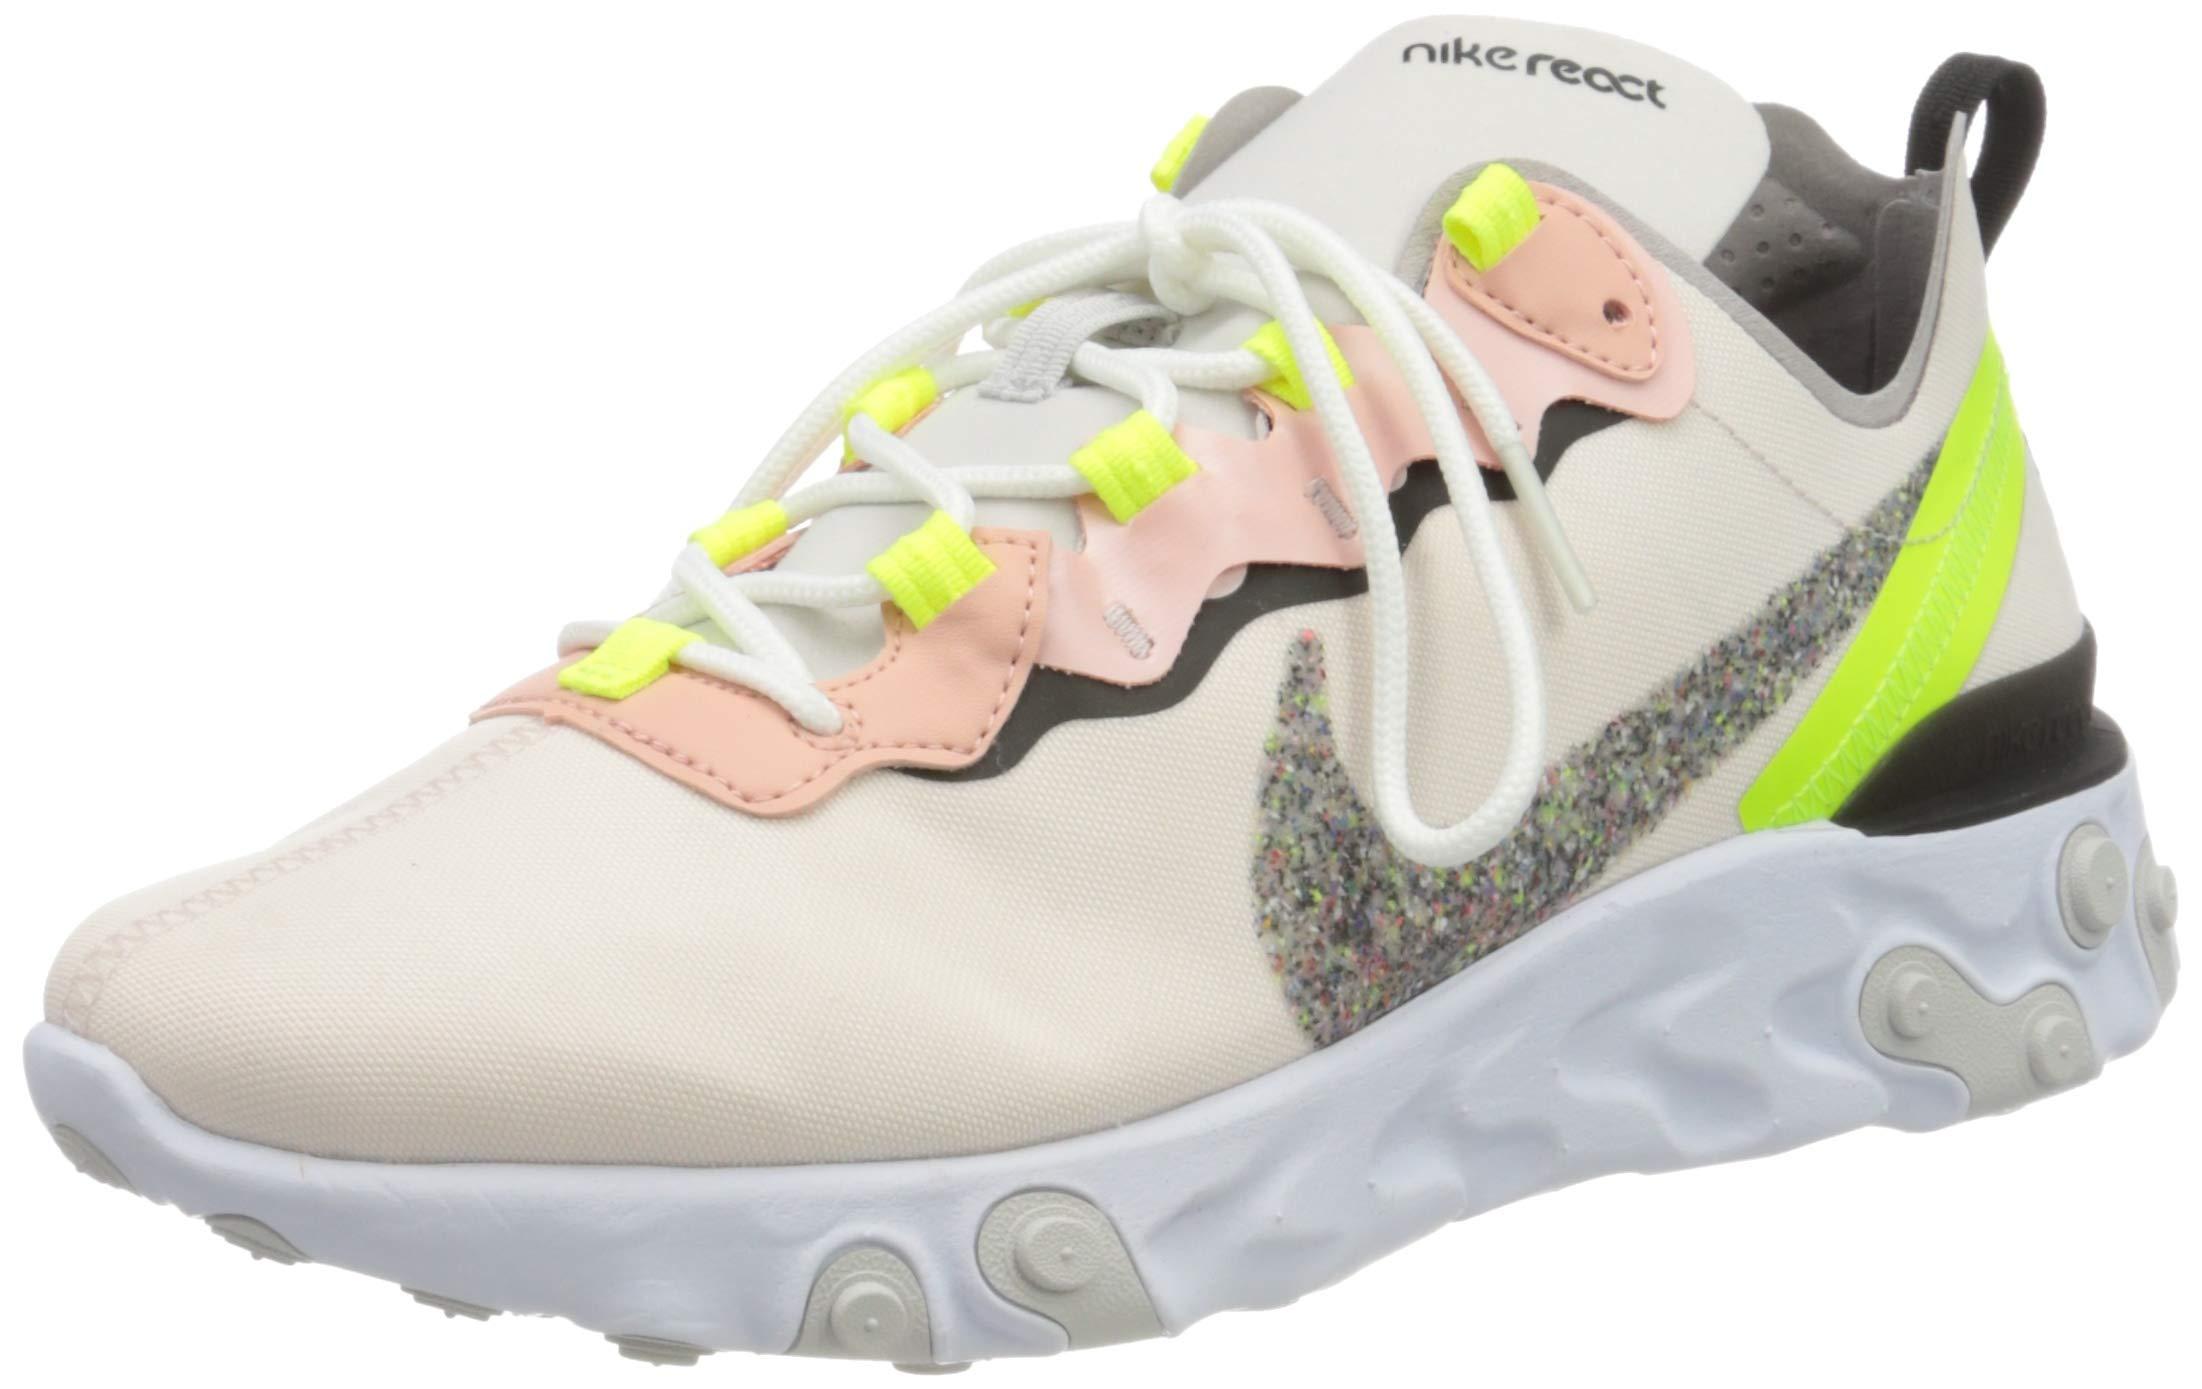 71wFG7GnFhL - Nike Women's W React Element 55 PRM Track & Field Shoes